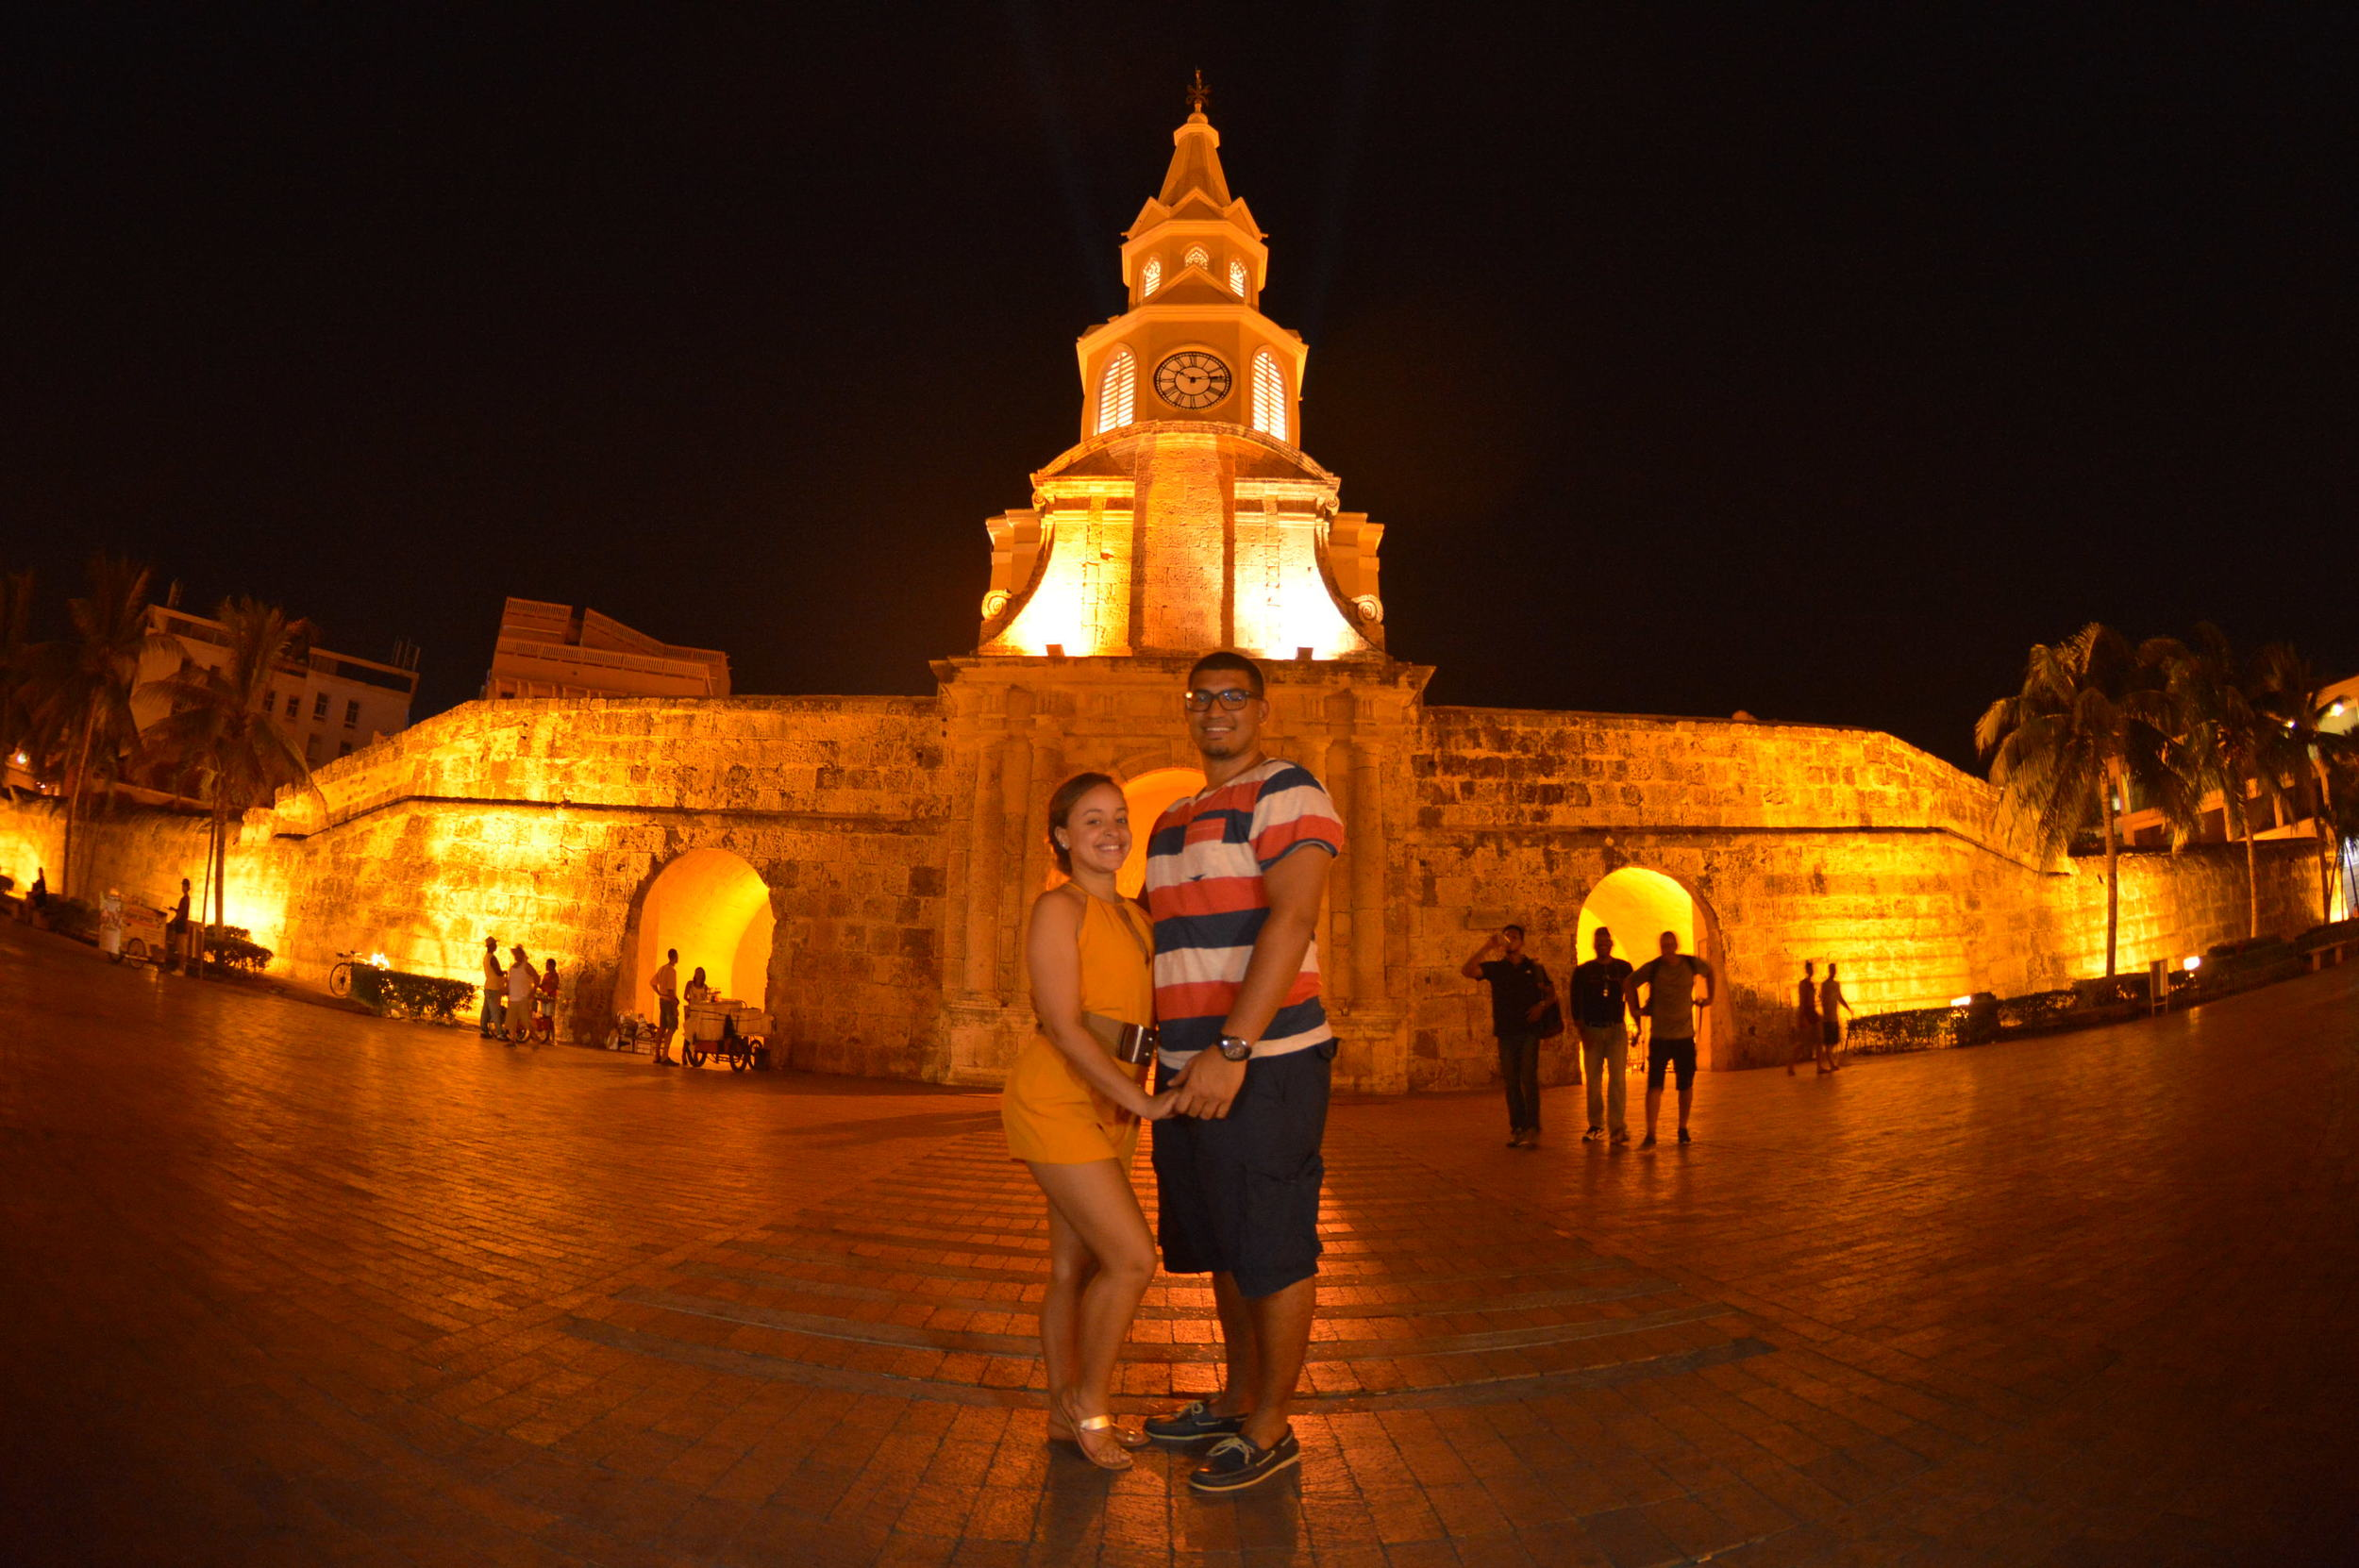 Luminous nights in Cartagena!